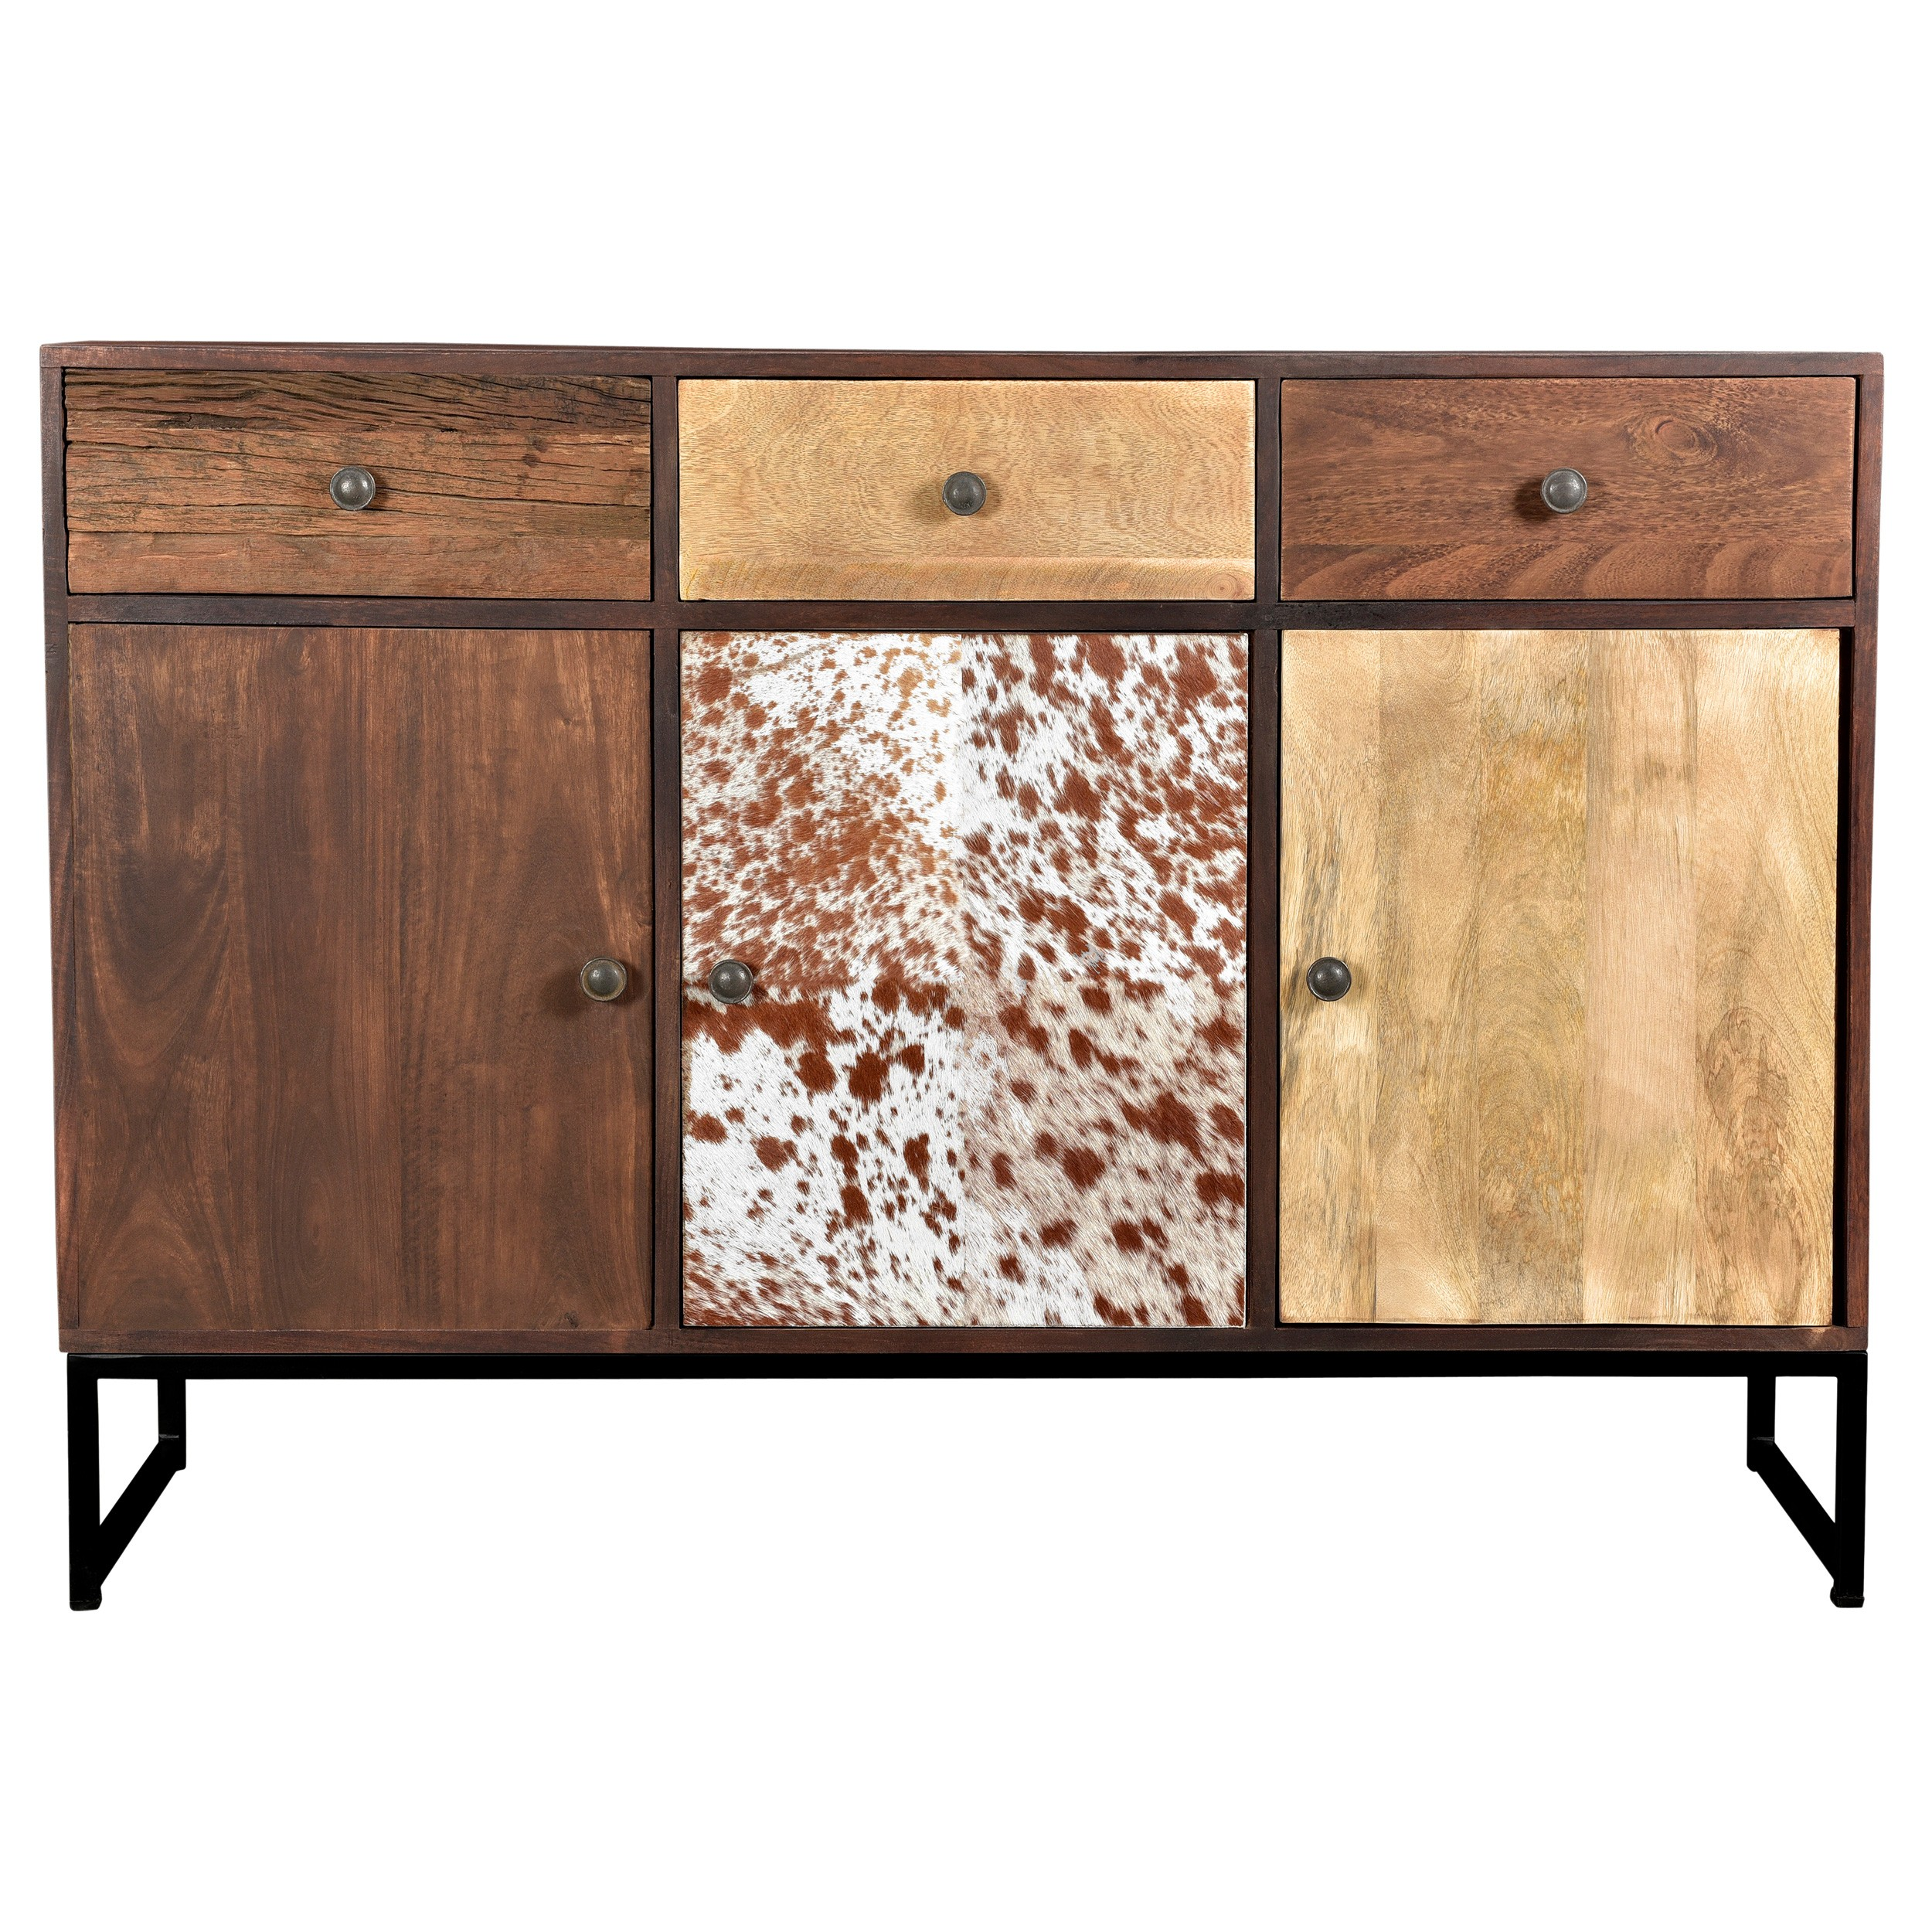 commode tanesh 3 tiroirs d couvrez les commodes tanesh 3 tiroirs design rdv d co. Black Bedroom Furniture Sets. Home Design Ideas